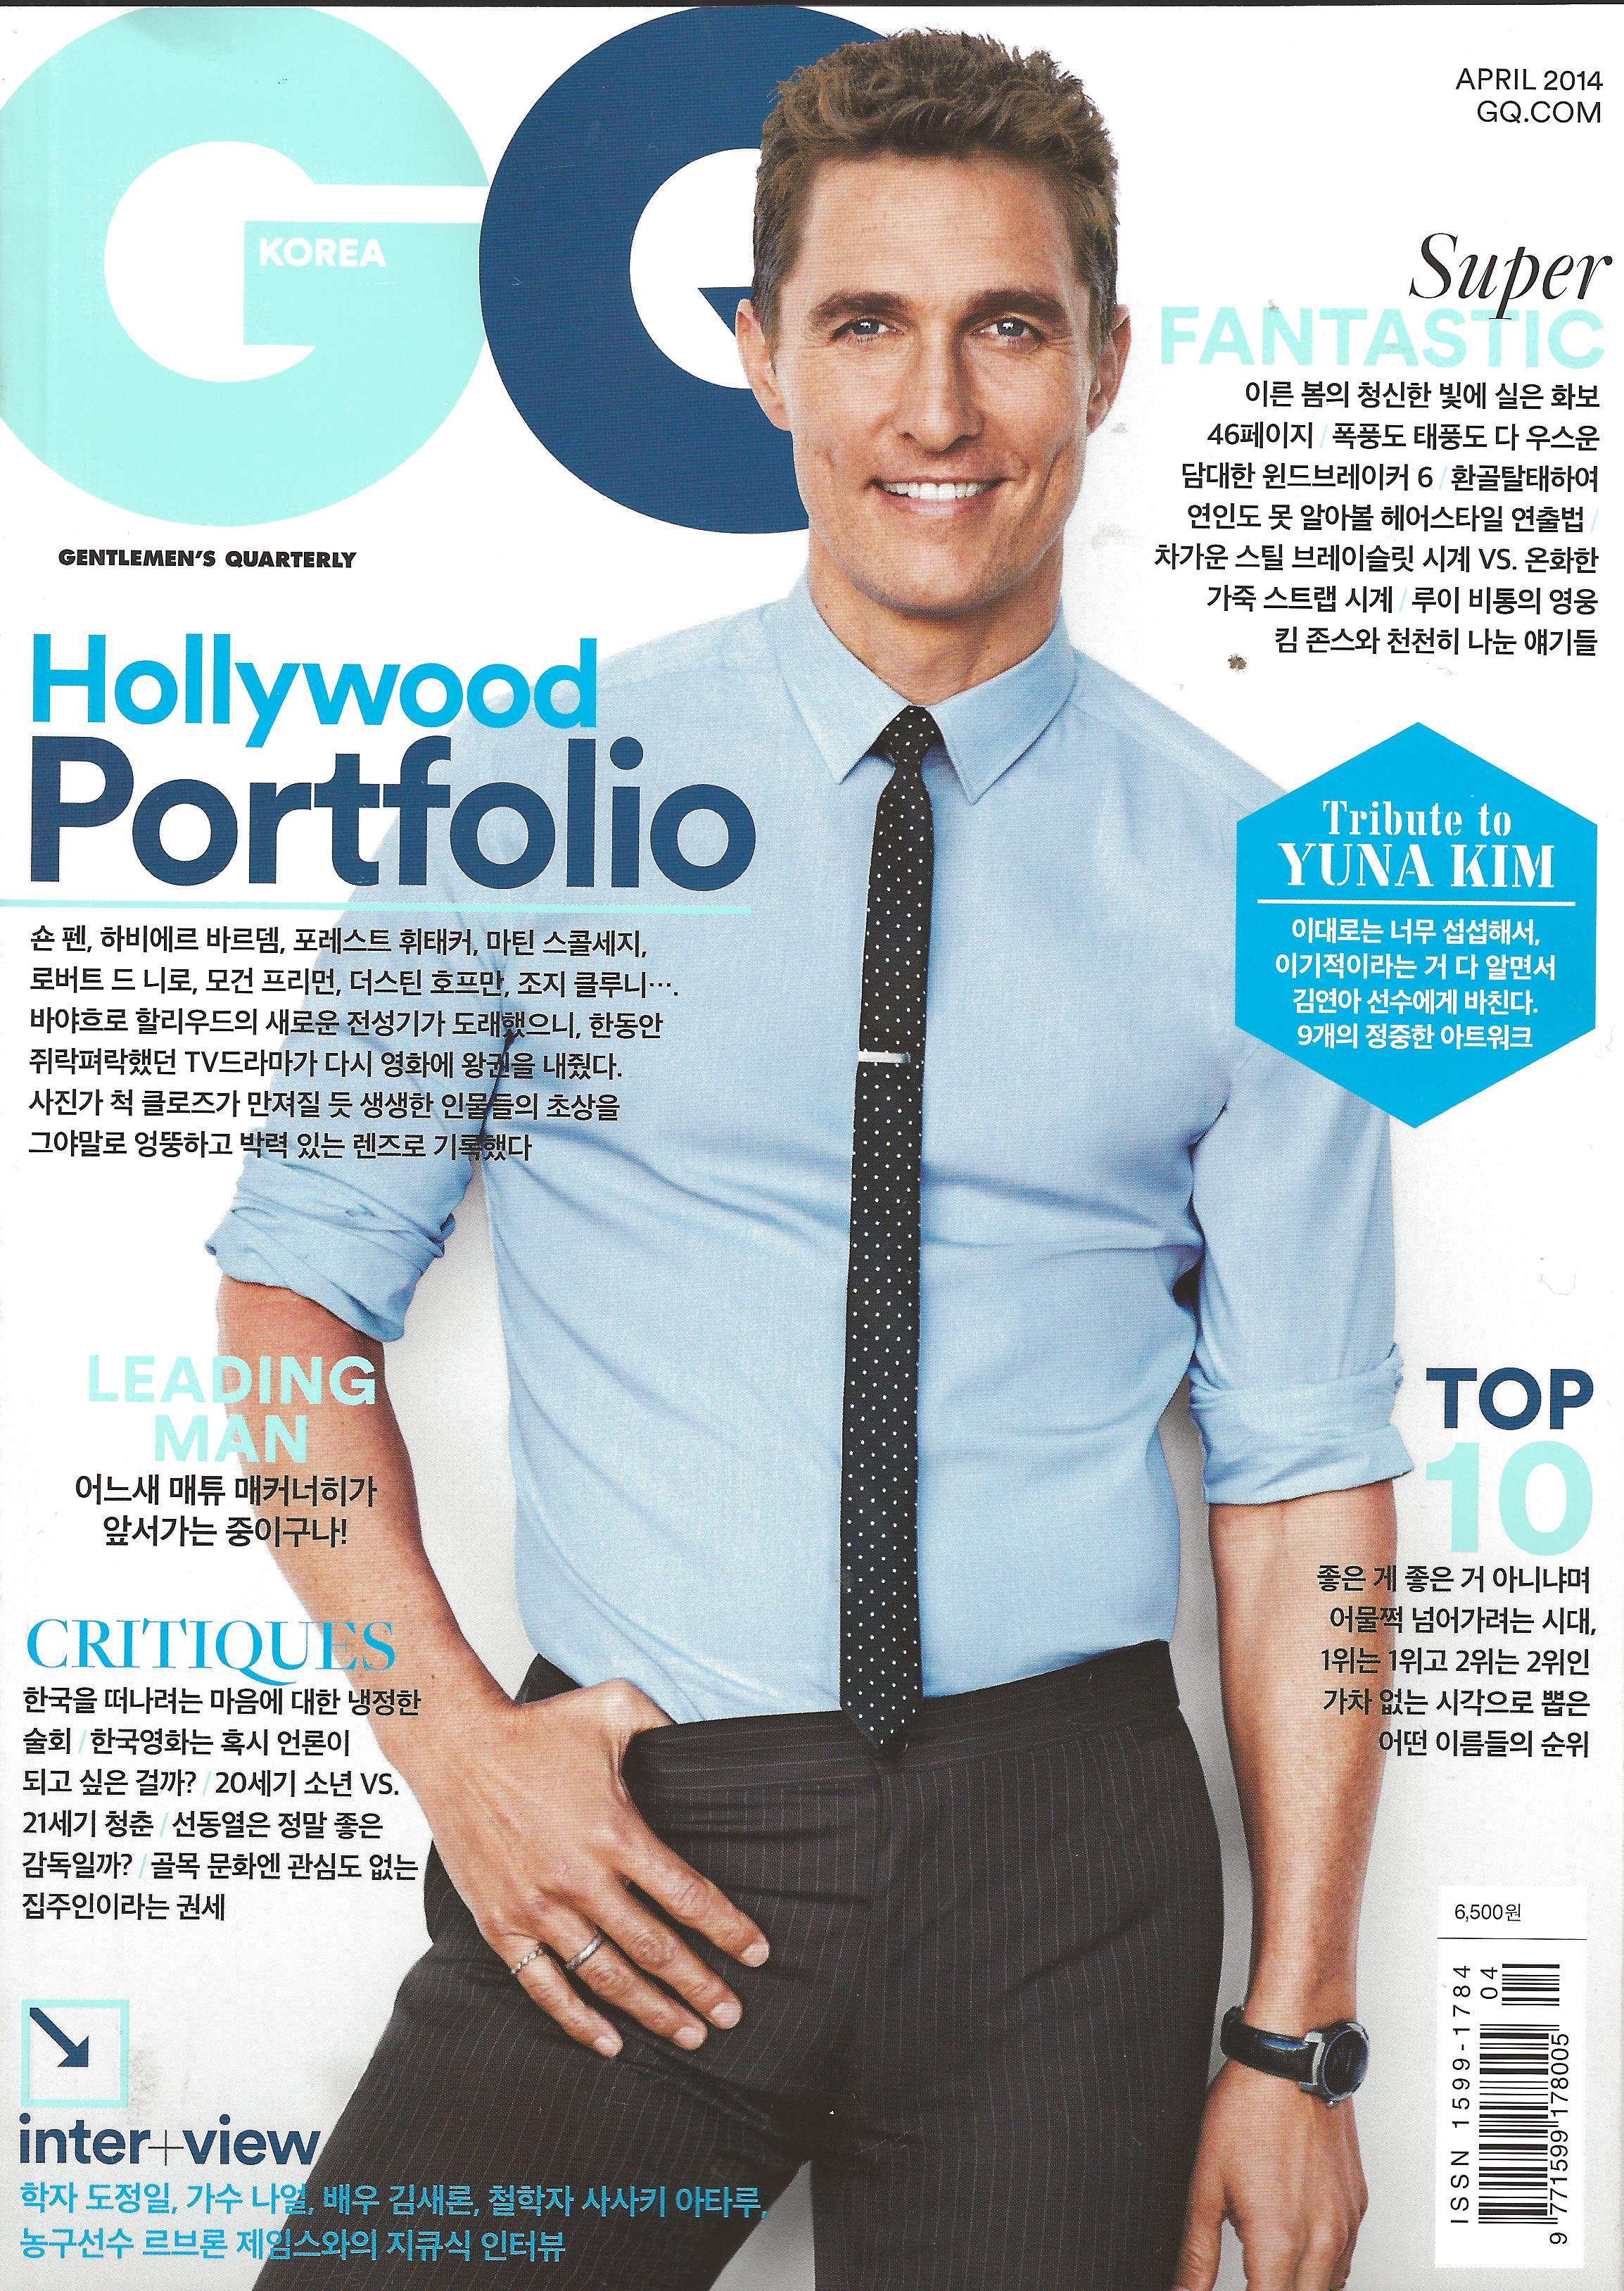 2014-4 GQ cover.jpg